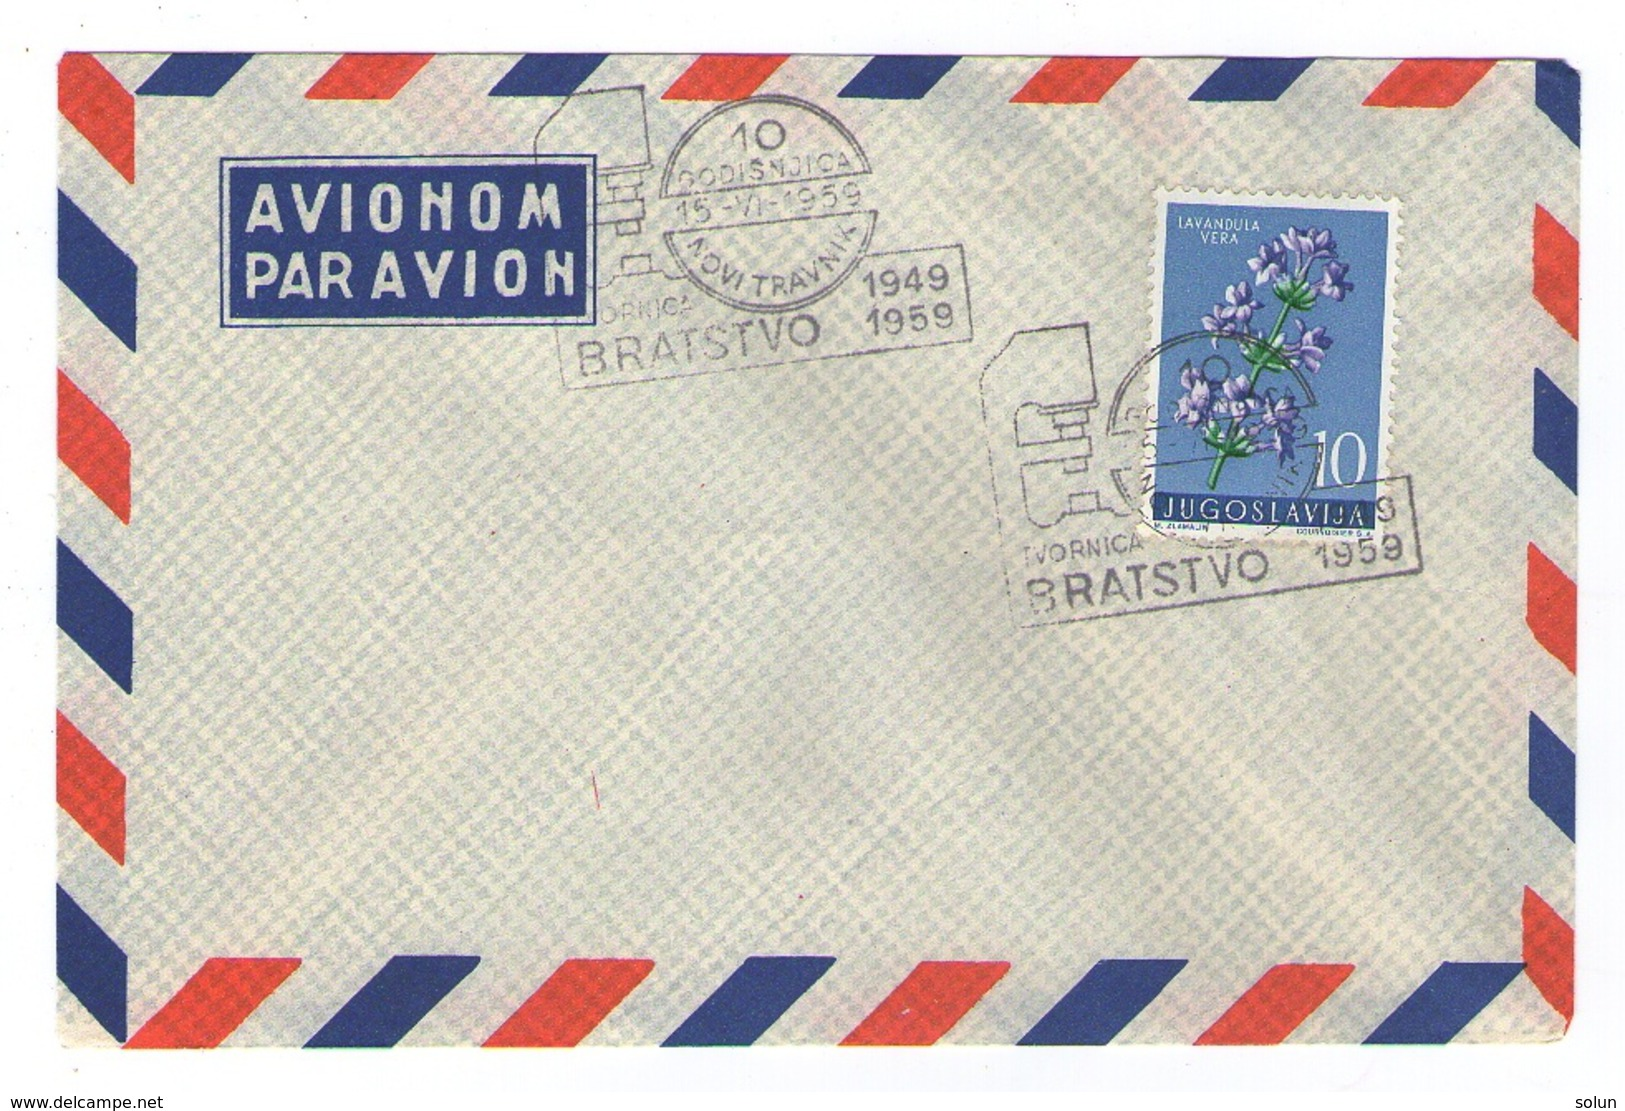 JUGOSLAVIJA YUGOSLAVIA AIR MAIL COVER SPECIAL POSTMARK TVORNICA BRATSTVO NOVI TRAVNIK 1949 1959 FACTORY - Covers & Documents